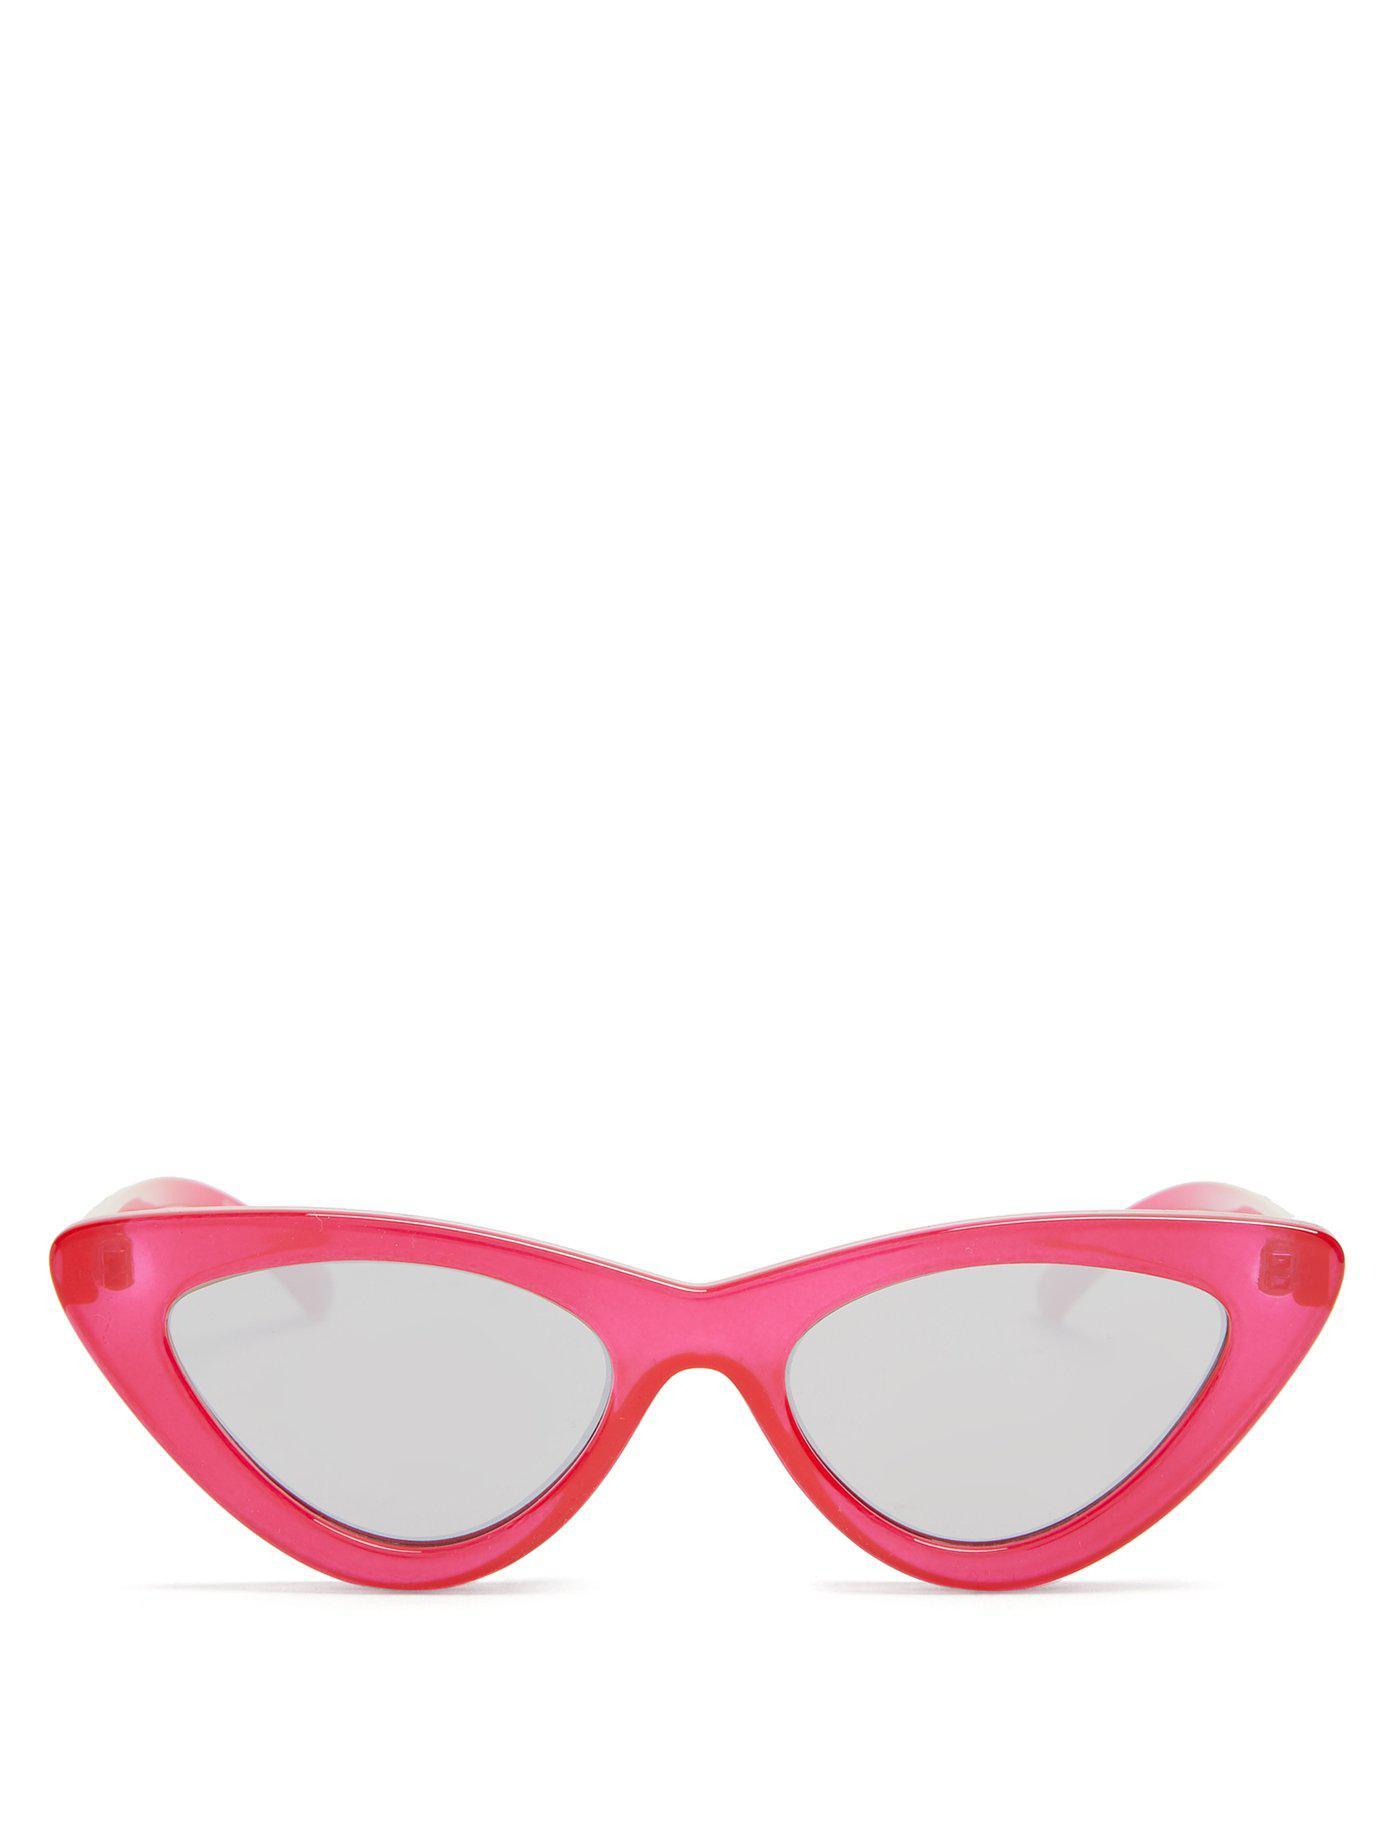 0faacb5b64e Lyst - Le Specs The Last Lolita Cat-eye Sunglasses in Red - Save 33%